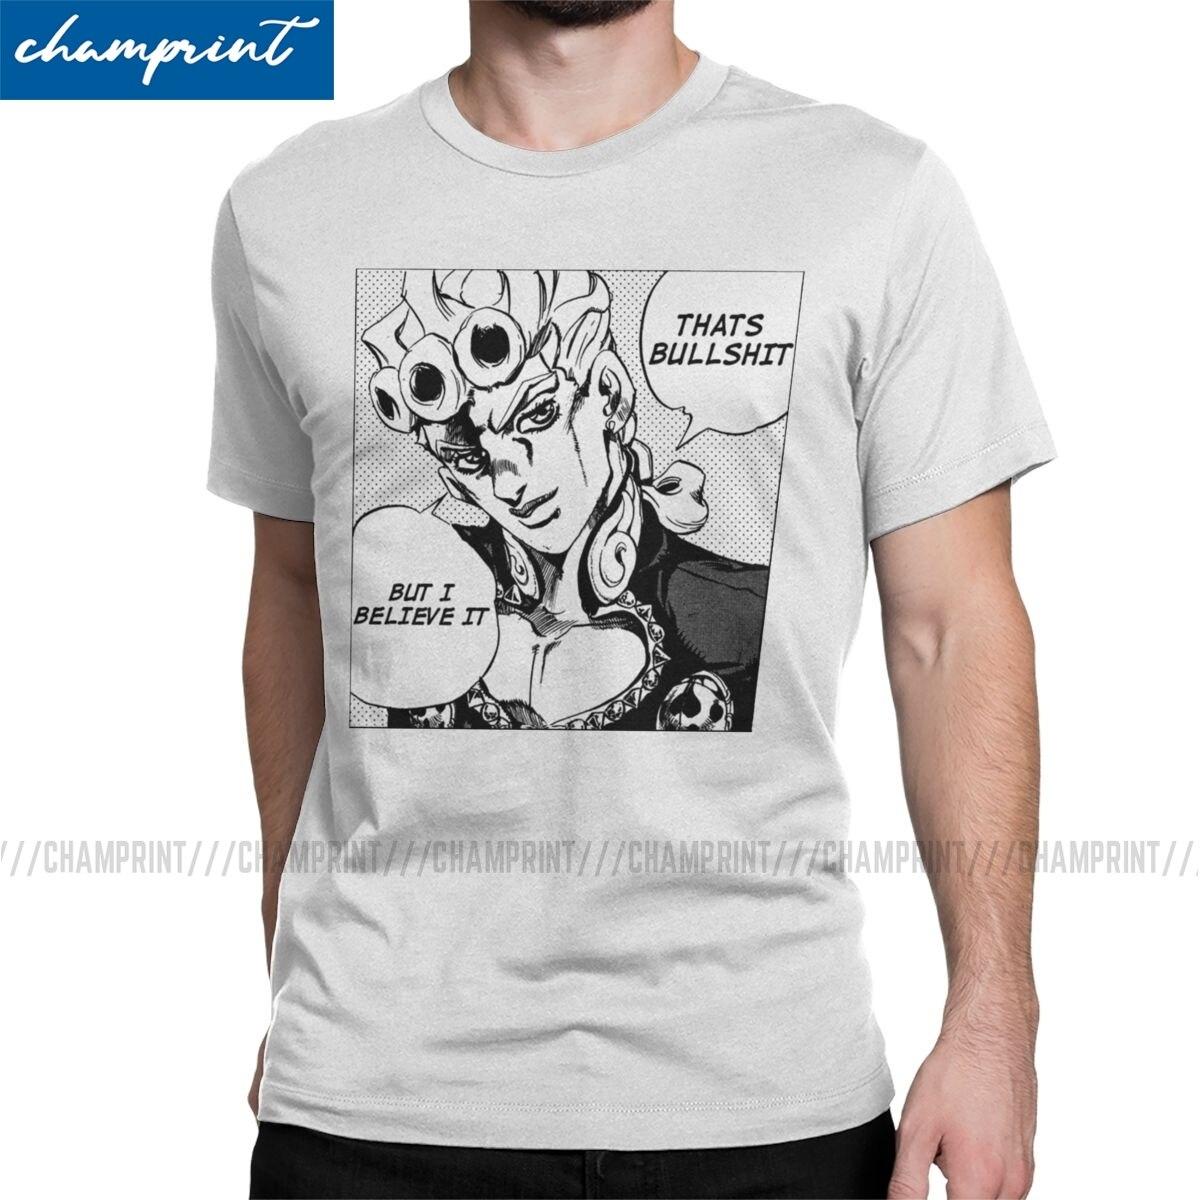 That's Bullshit T Shirts Men's Cotton Funny T-Shirts Jojos Bizarre Adventure Anime Jjba Manga Tees Short Sleeve Clothing 6XL